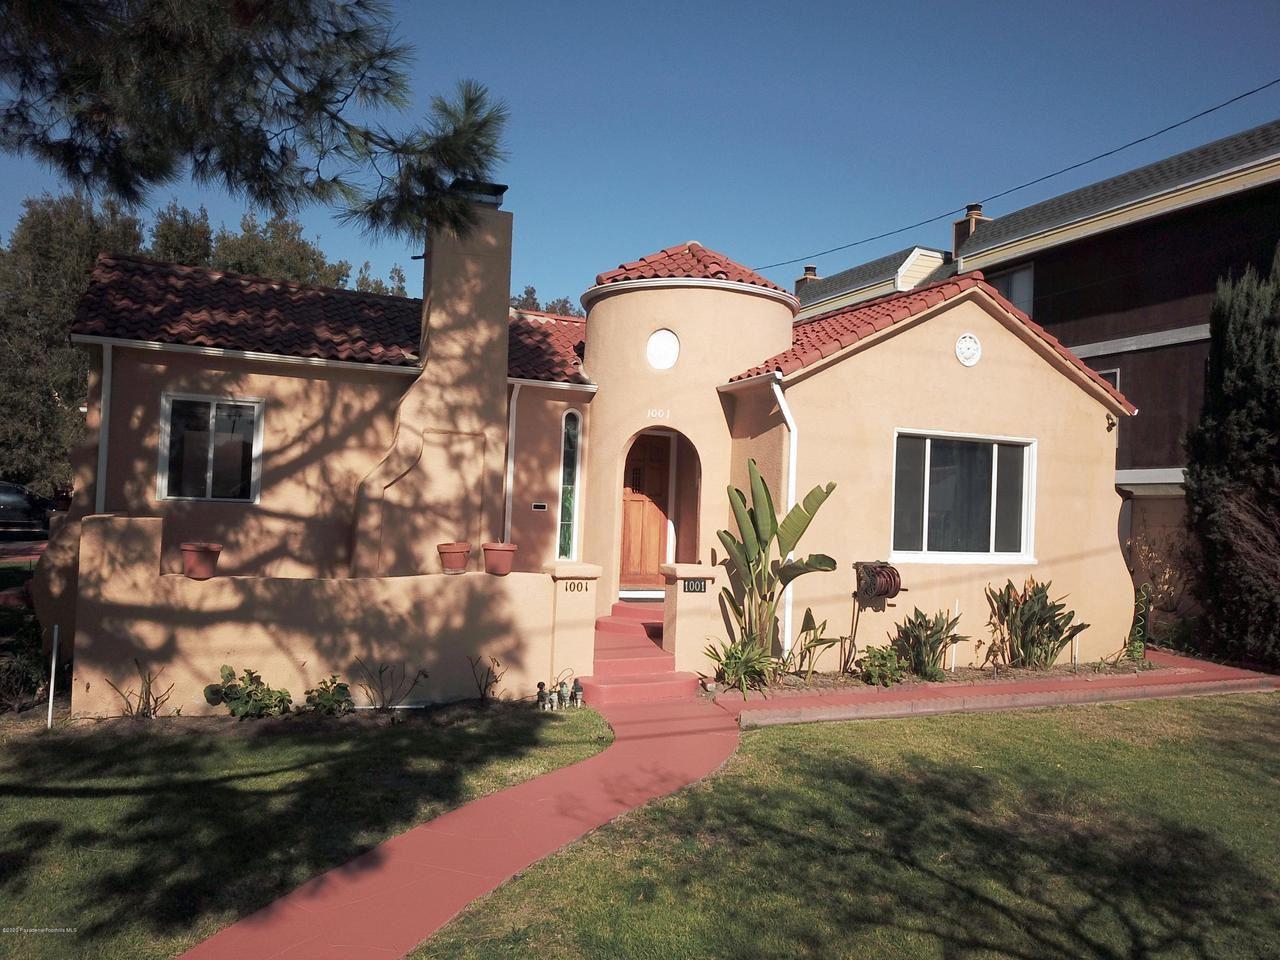 Photo of 1001 MONTEREY Road, Glendale, CA 91206 (MLS # 820000530)